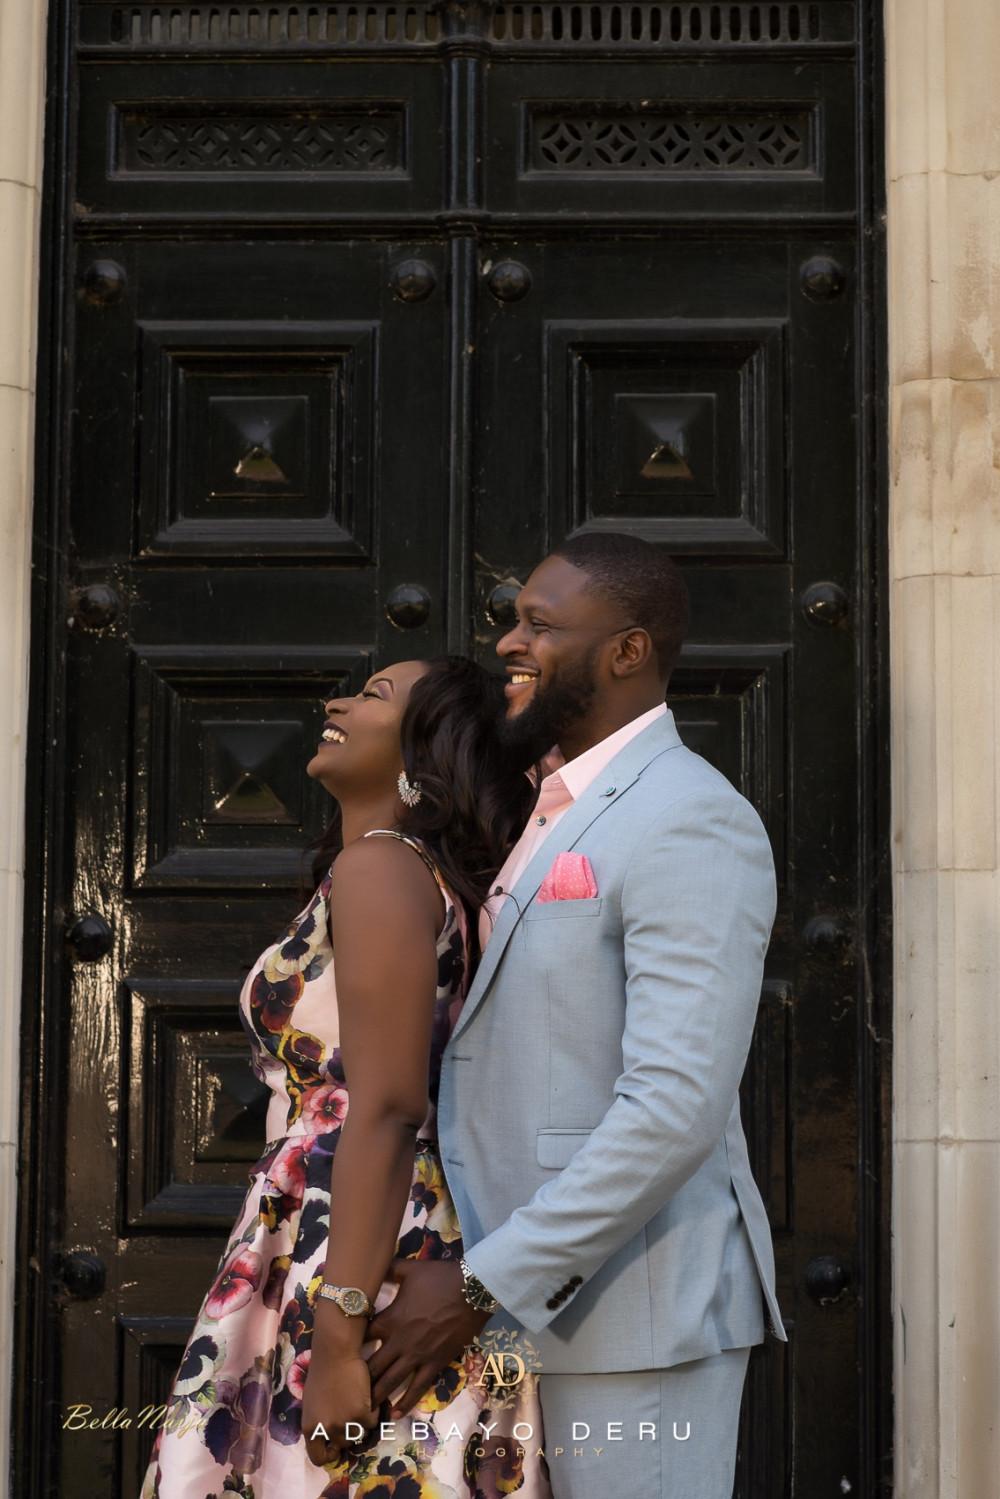 DTunes2015_Dunni and Babatunde_Adebayo Deru_Pre Wedding Shoot_Dunni_Babatunde-4